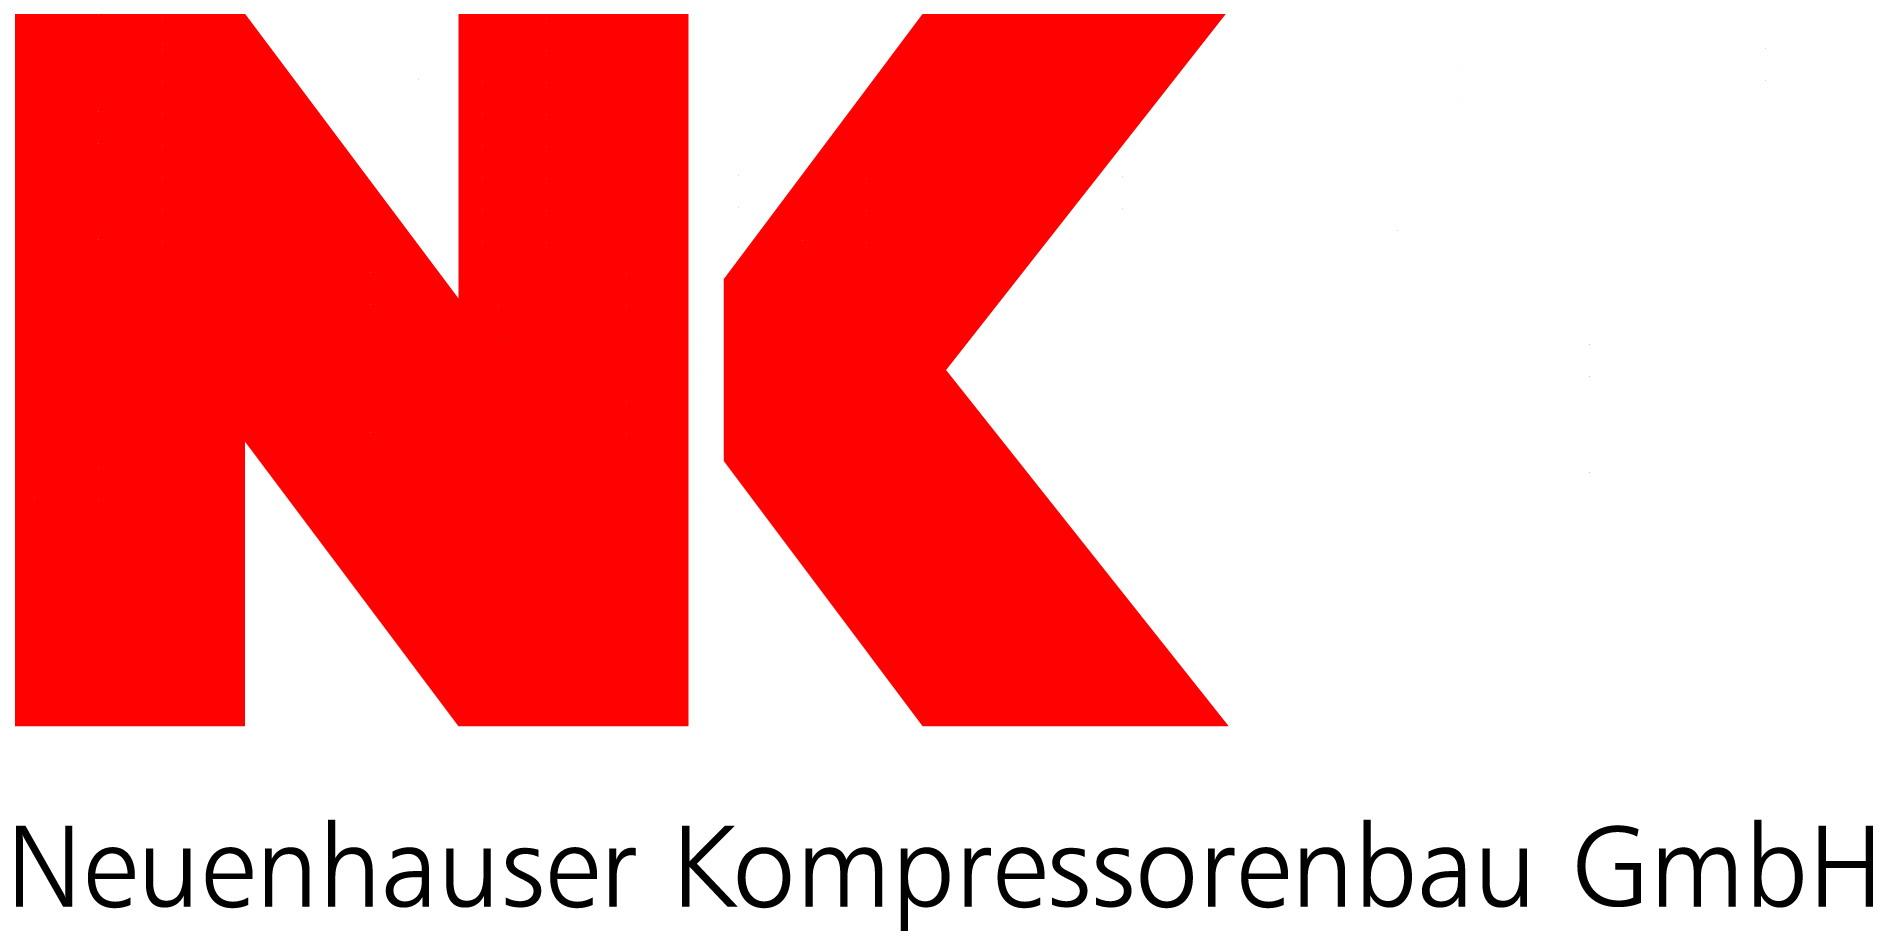 Neuenhauser Kompressorenbau GmbH